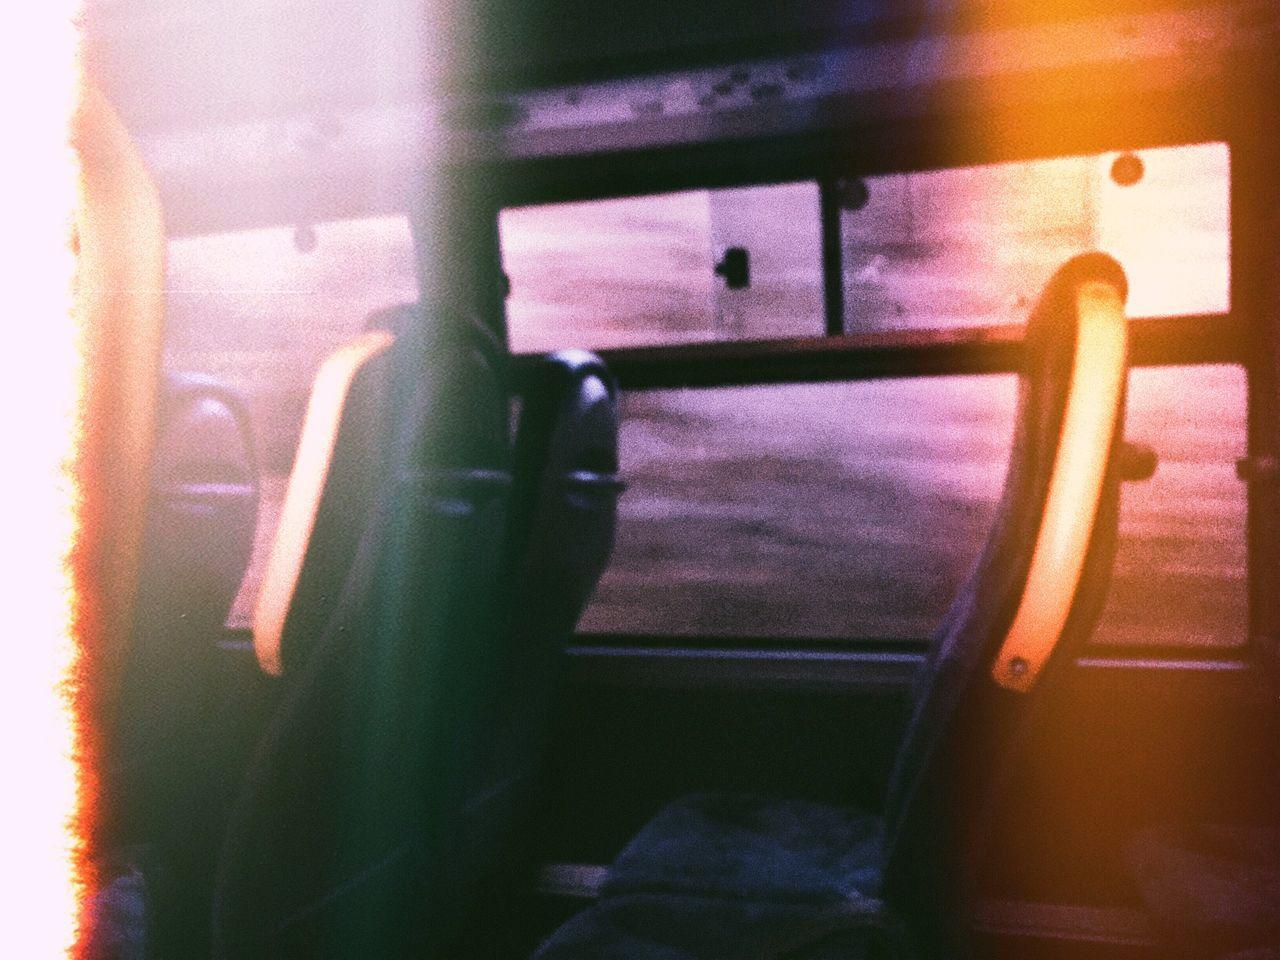 vehicle interior, train - vehicle, transportation, public transportation, train interior, mode of transport, passenger train, indoors, bus, rail transportation, subway train, vehicle seat, land vehicle, window, journey, illuminated, no people, close-up, day